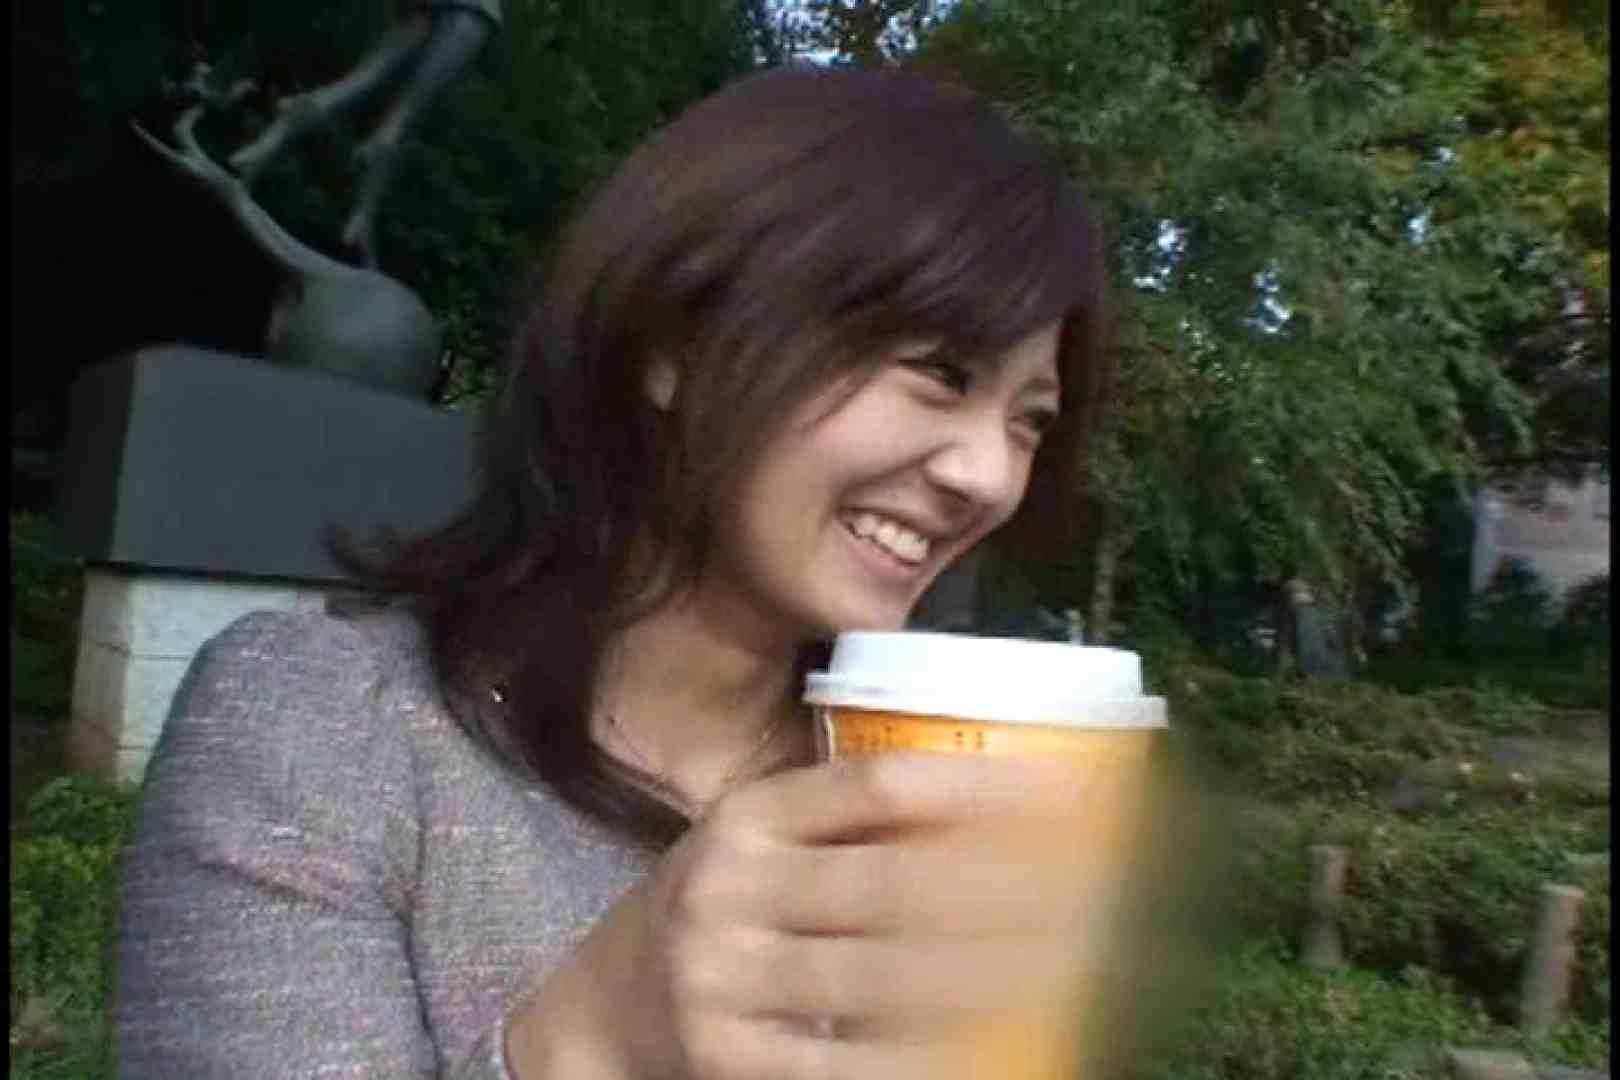 JDハンター全国ツアー vol.035 前編 女子大生のエロ動画 | 0  110PIX 43